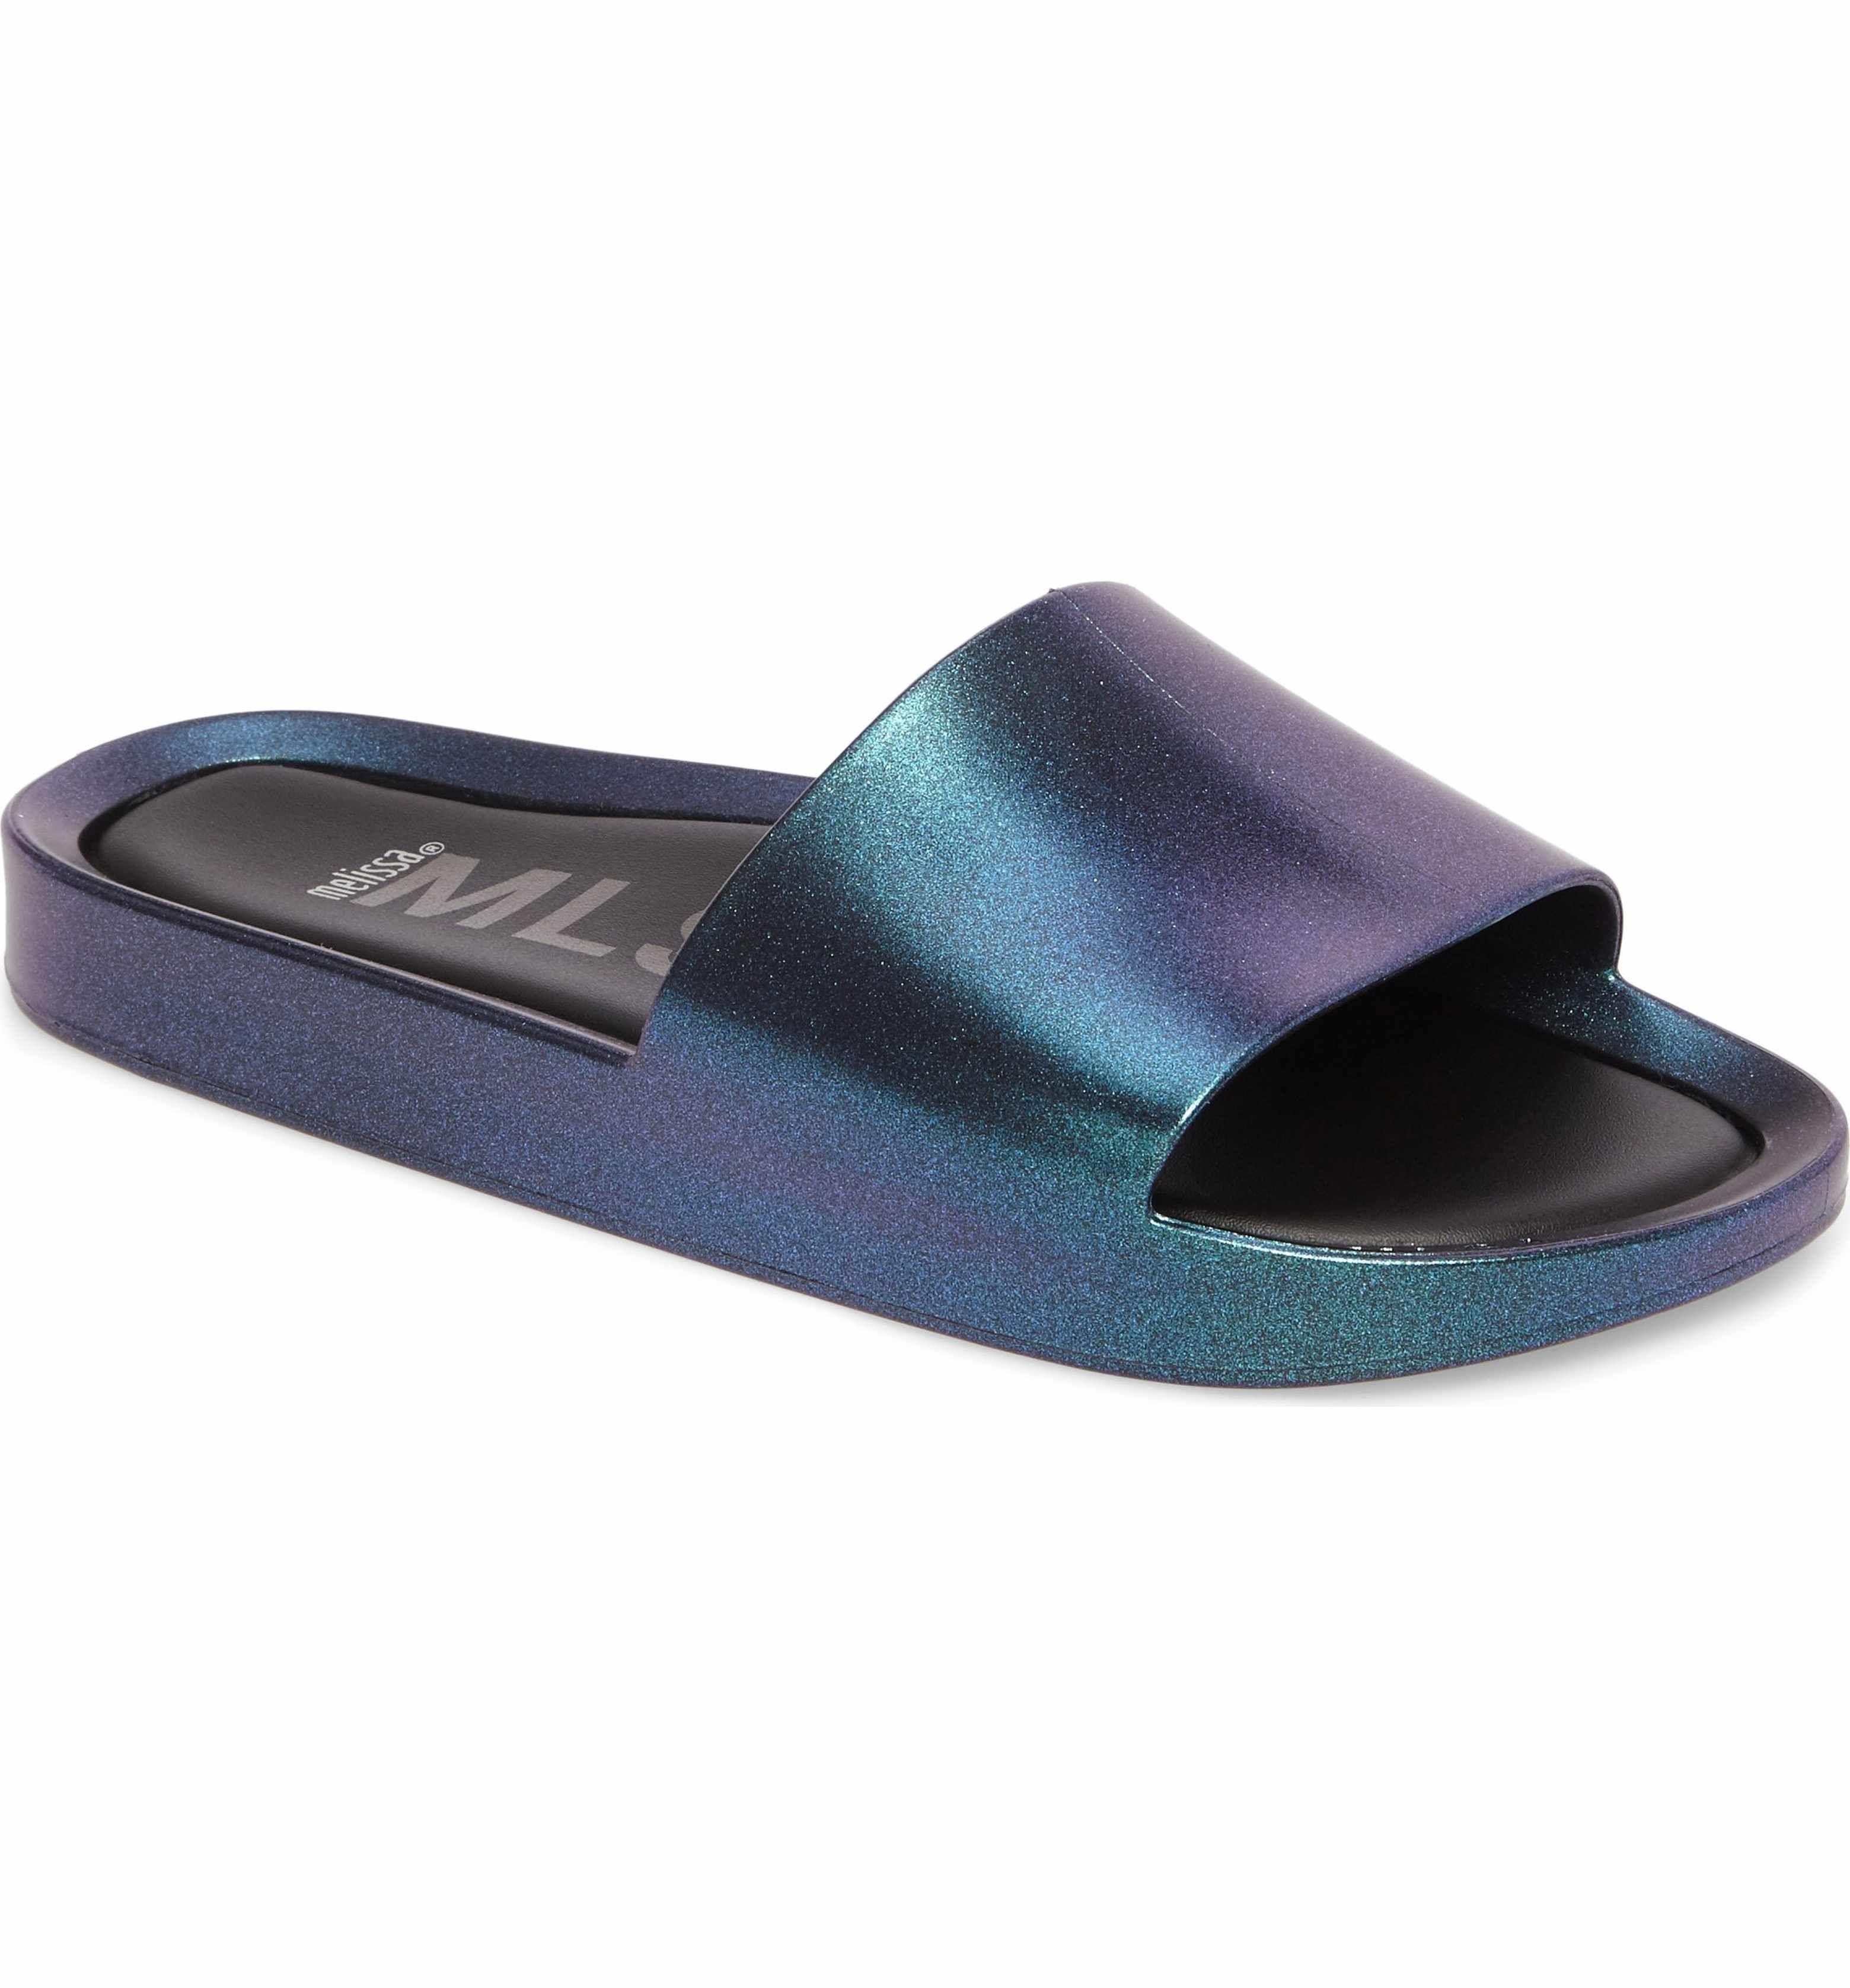 c55f89f7e7 Main Image - Melissa Beach Slide Sandal (Women)